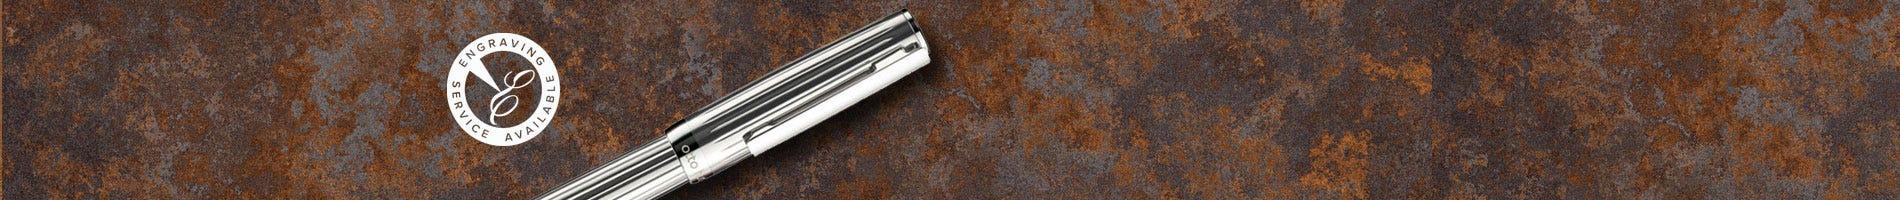 Otto Hut lined sterling silver design 04 pen